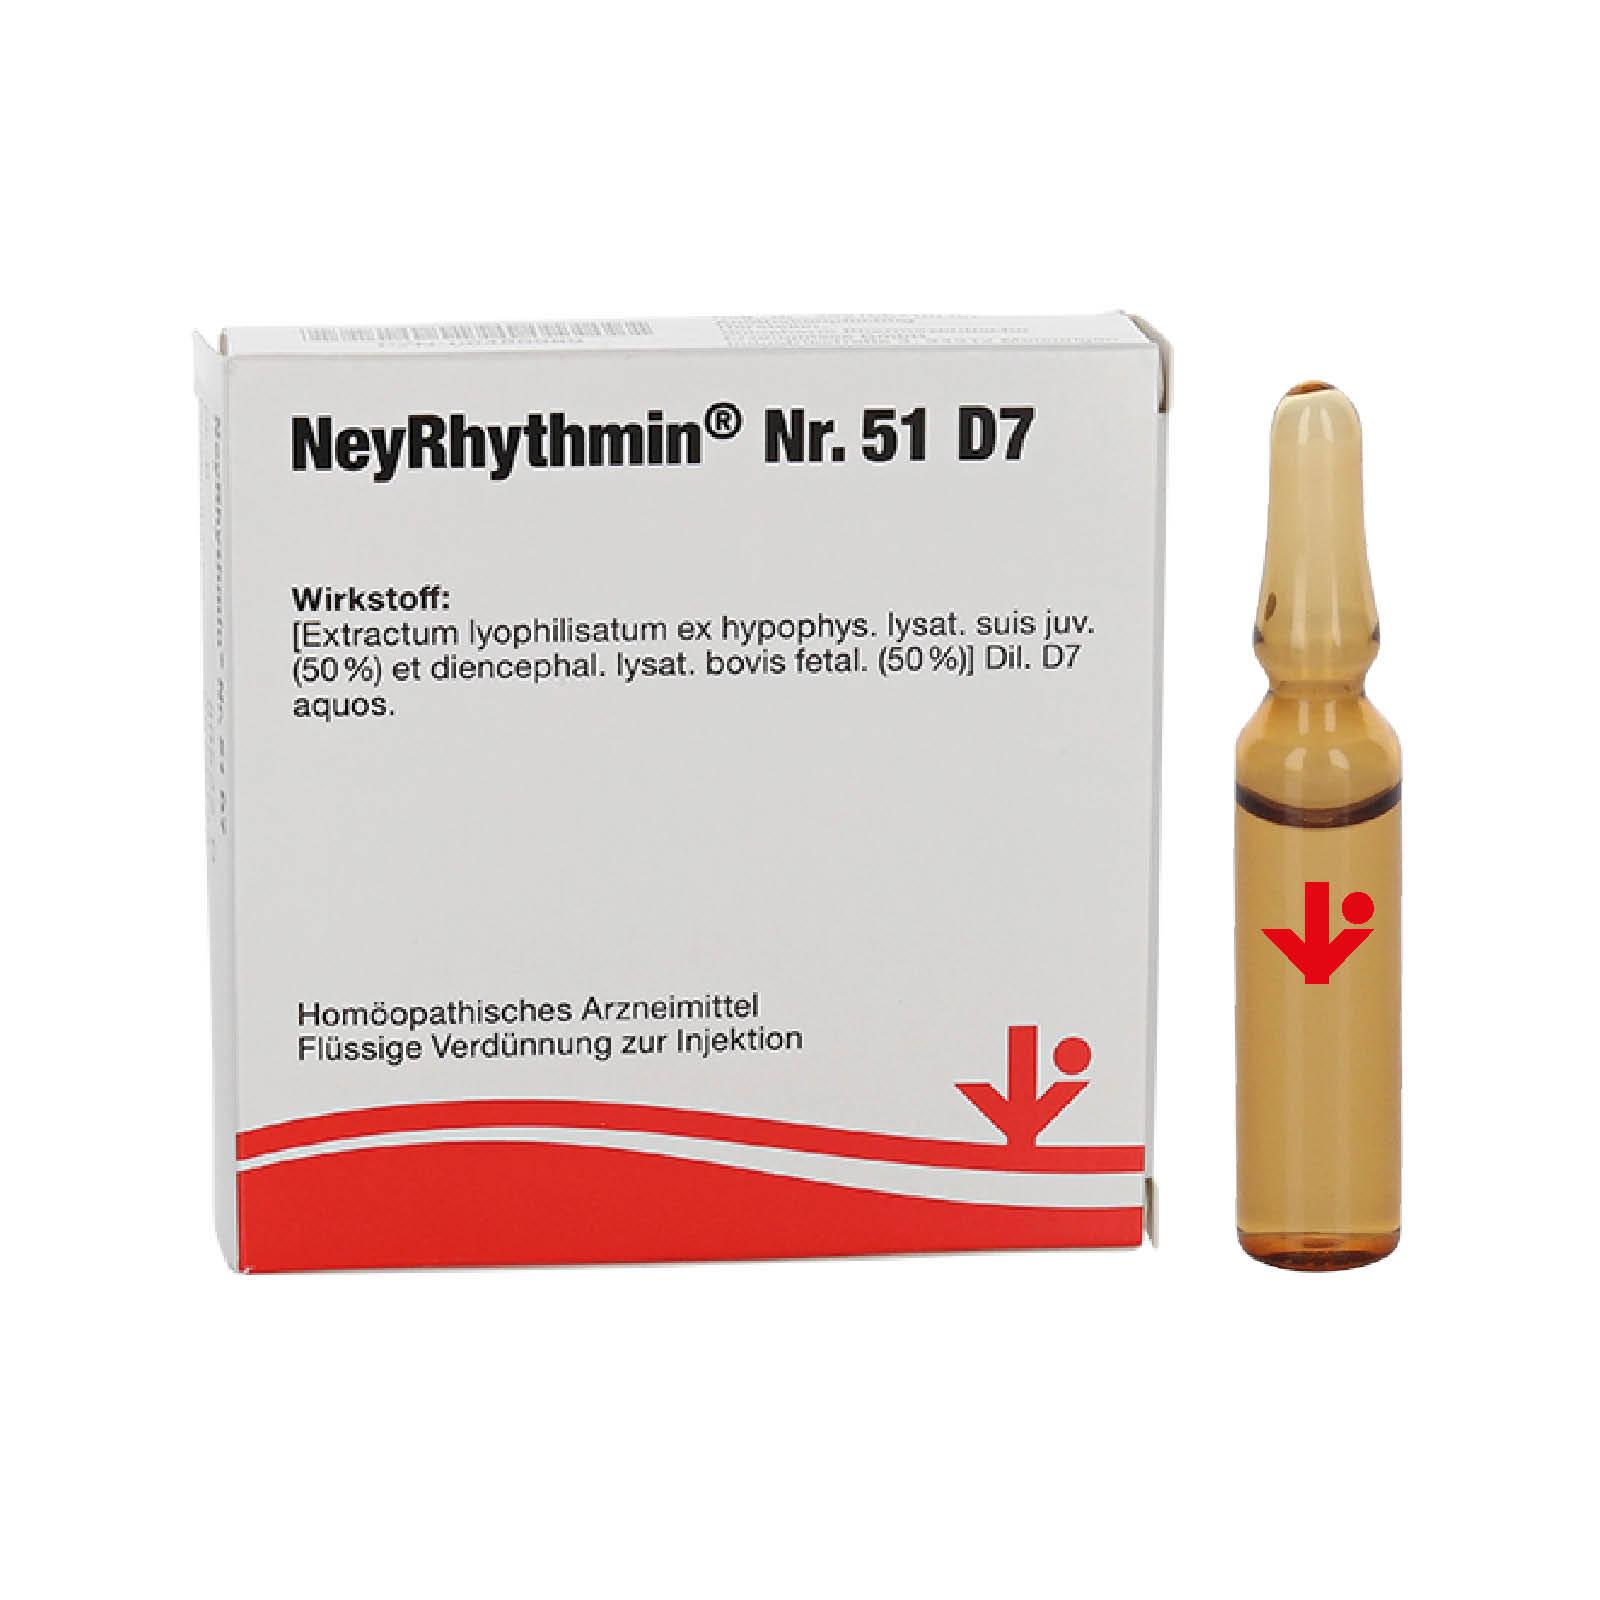 NeyRhythmin® Nr. 51 D7